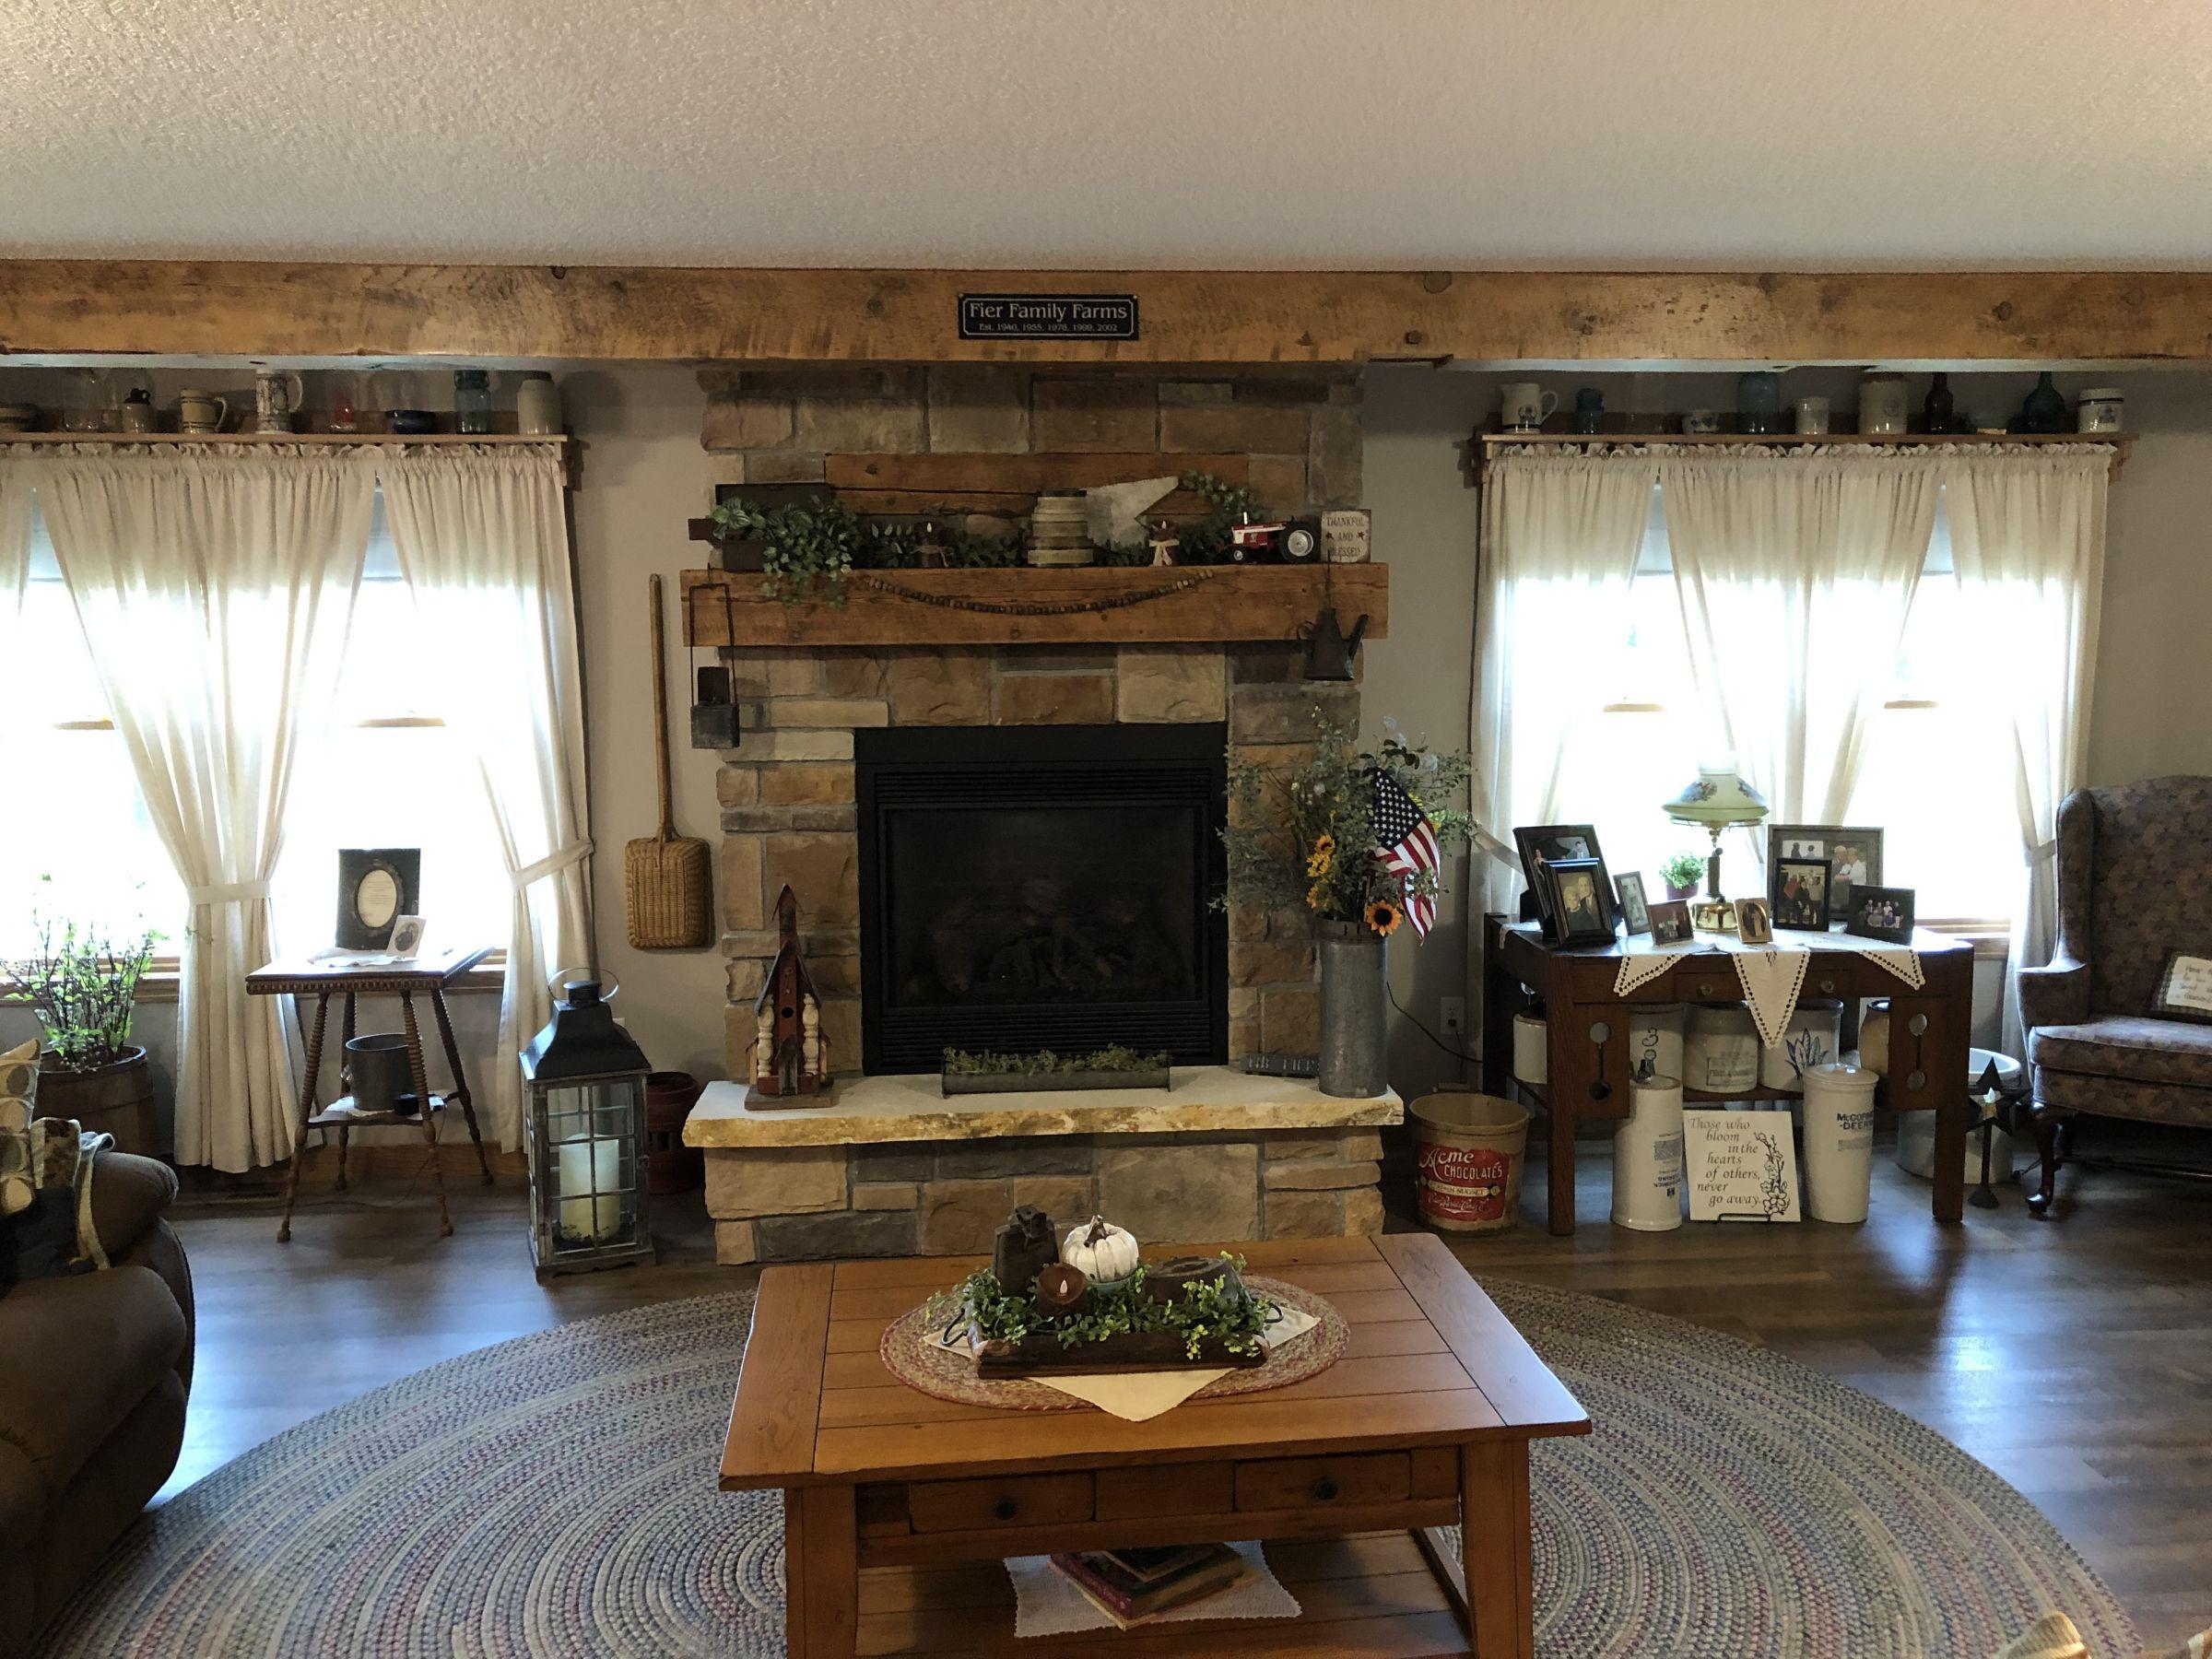 land-jackson-county-iowa-100-acres-listing-number-15703-8-2021-09-03-144242.jpg